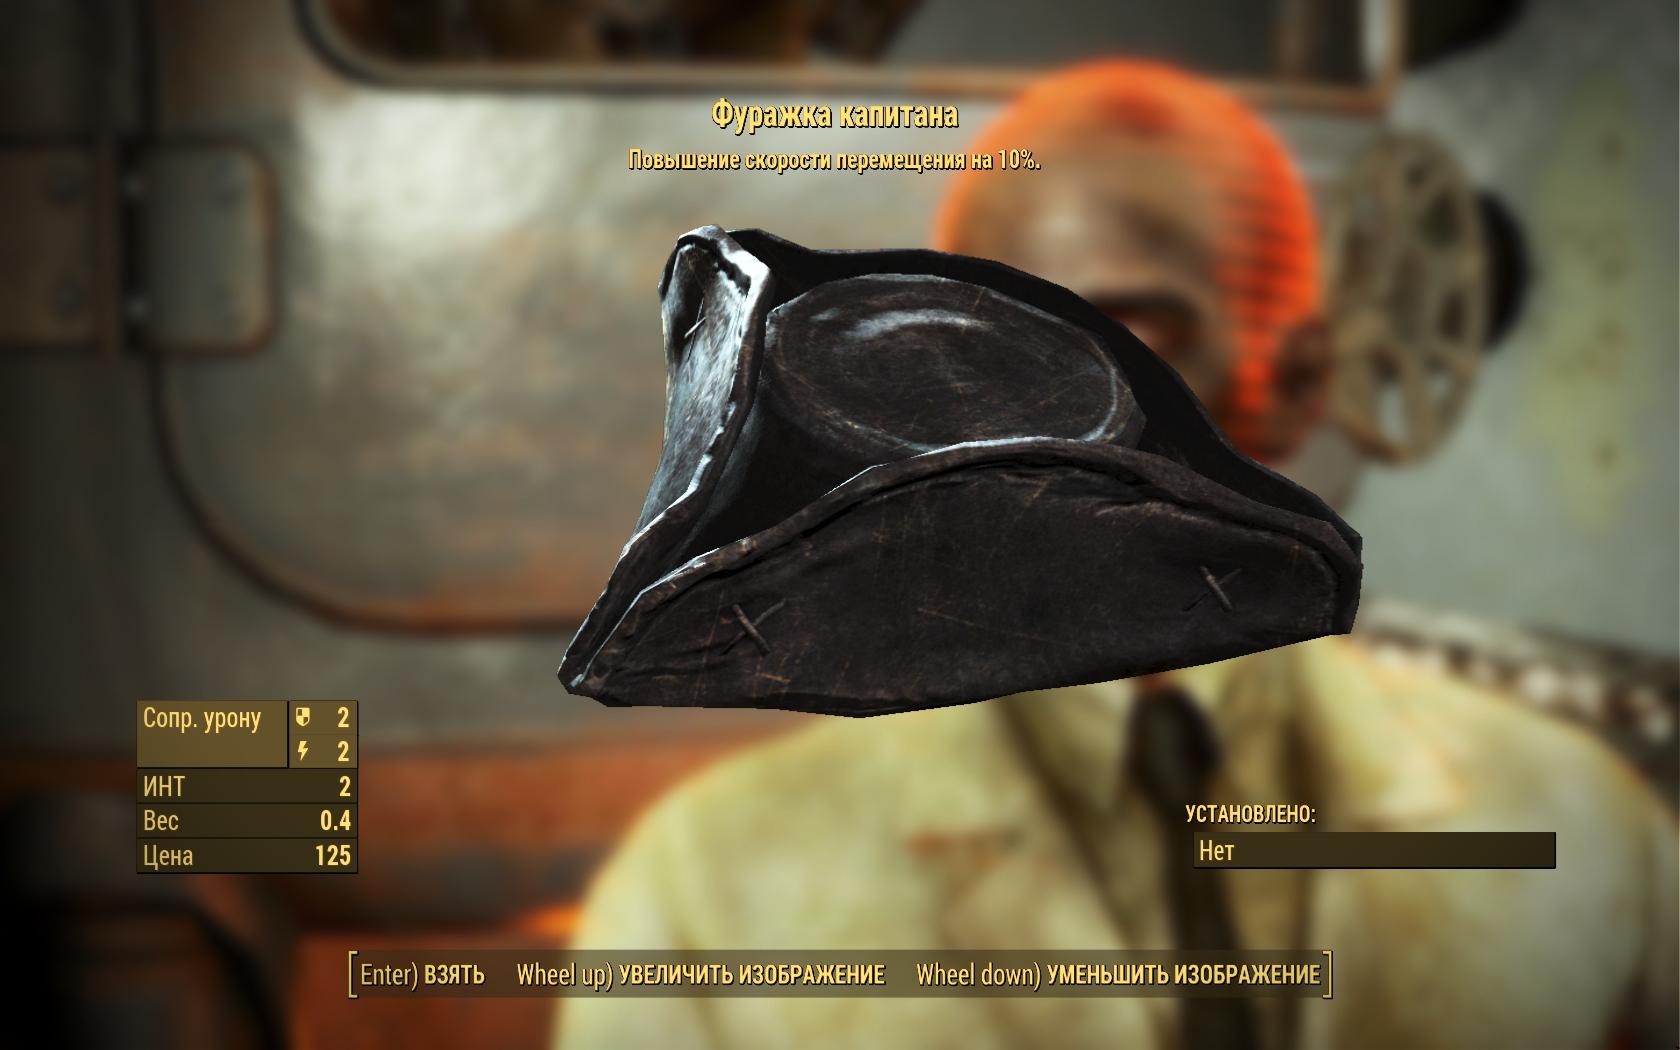 капитан - Fallout 4 Одежда, подарок, Райт, Тедди Райт, Фуражка, Фуражка капитана